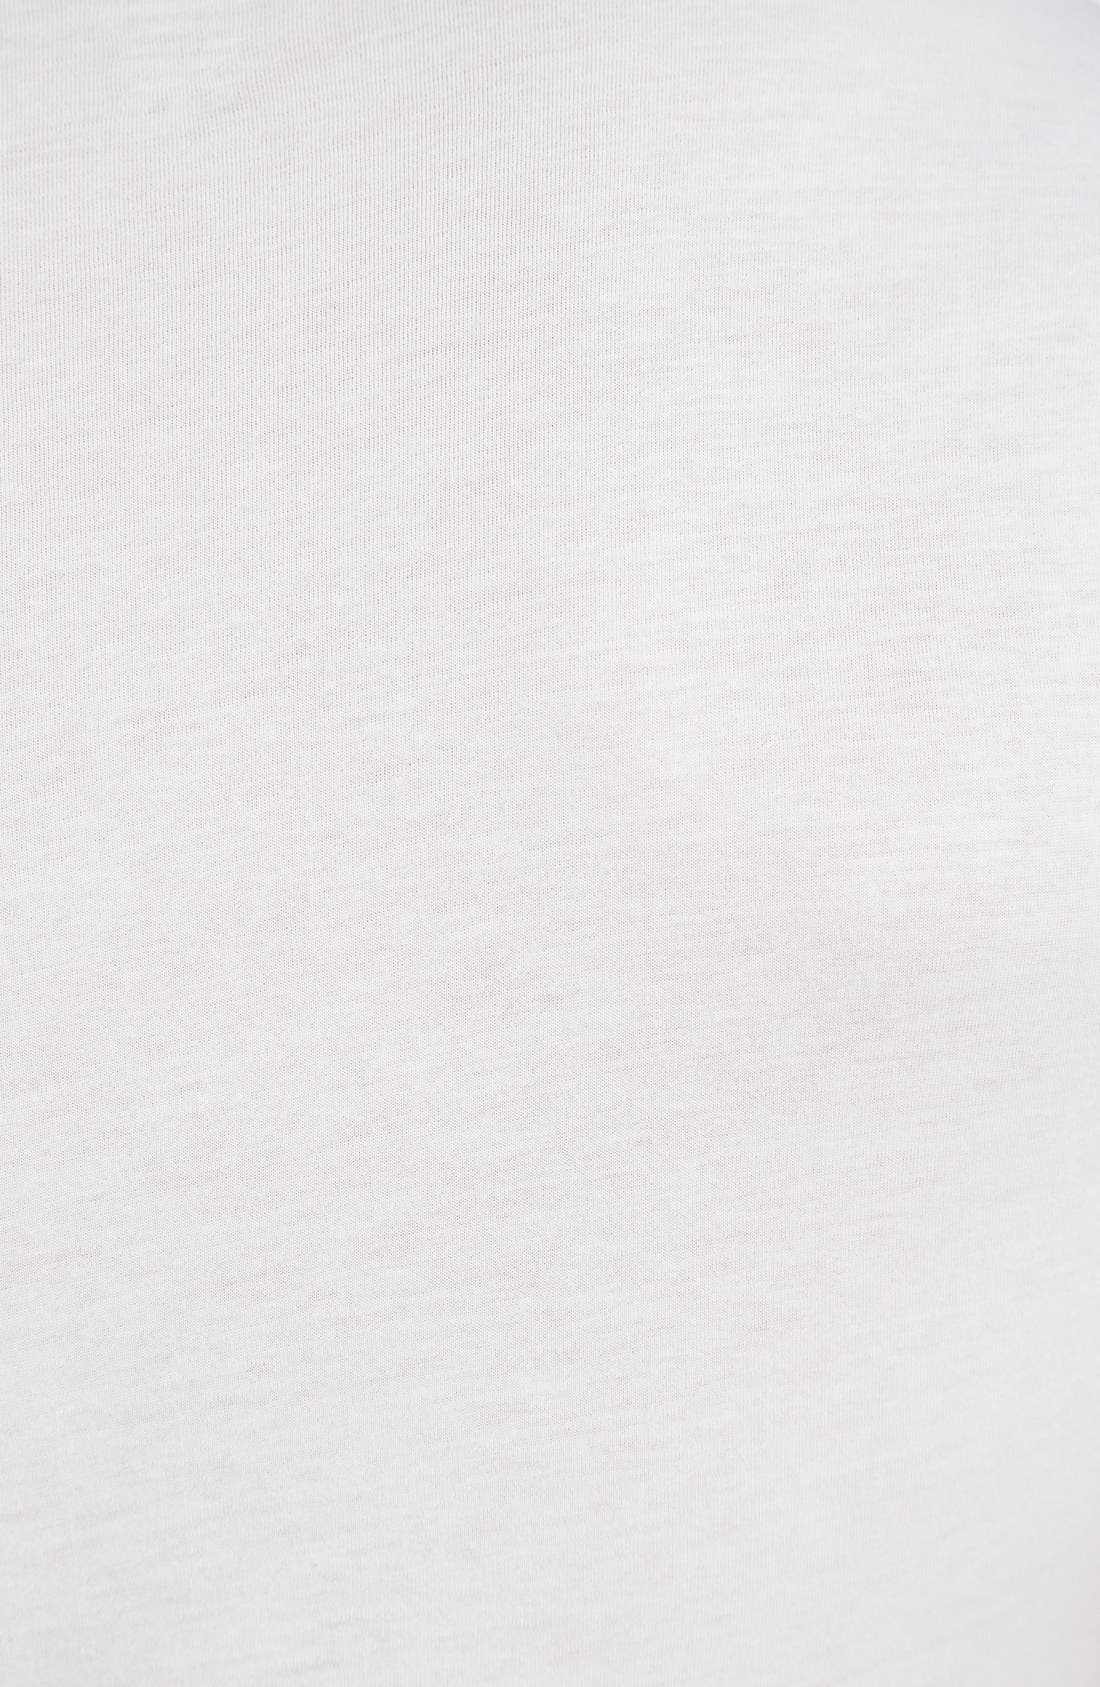 Slim Fit Pima Cotton Deep V-Neck T-Shirt,                             Alternate thumbnail 3, color,                             WHITE